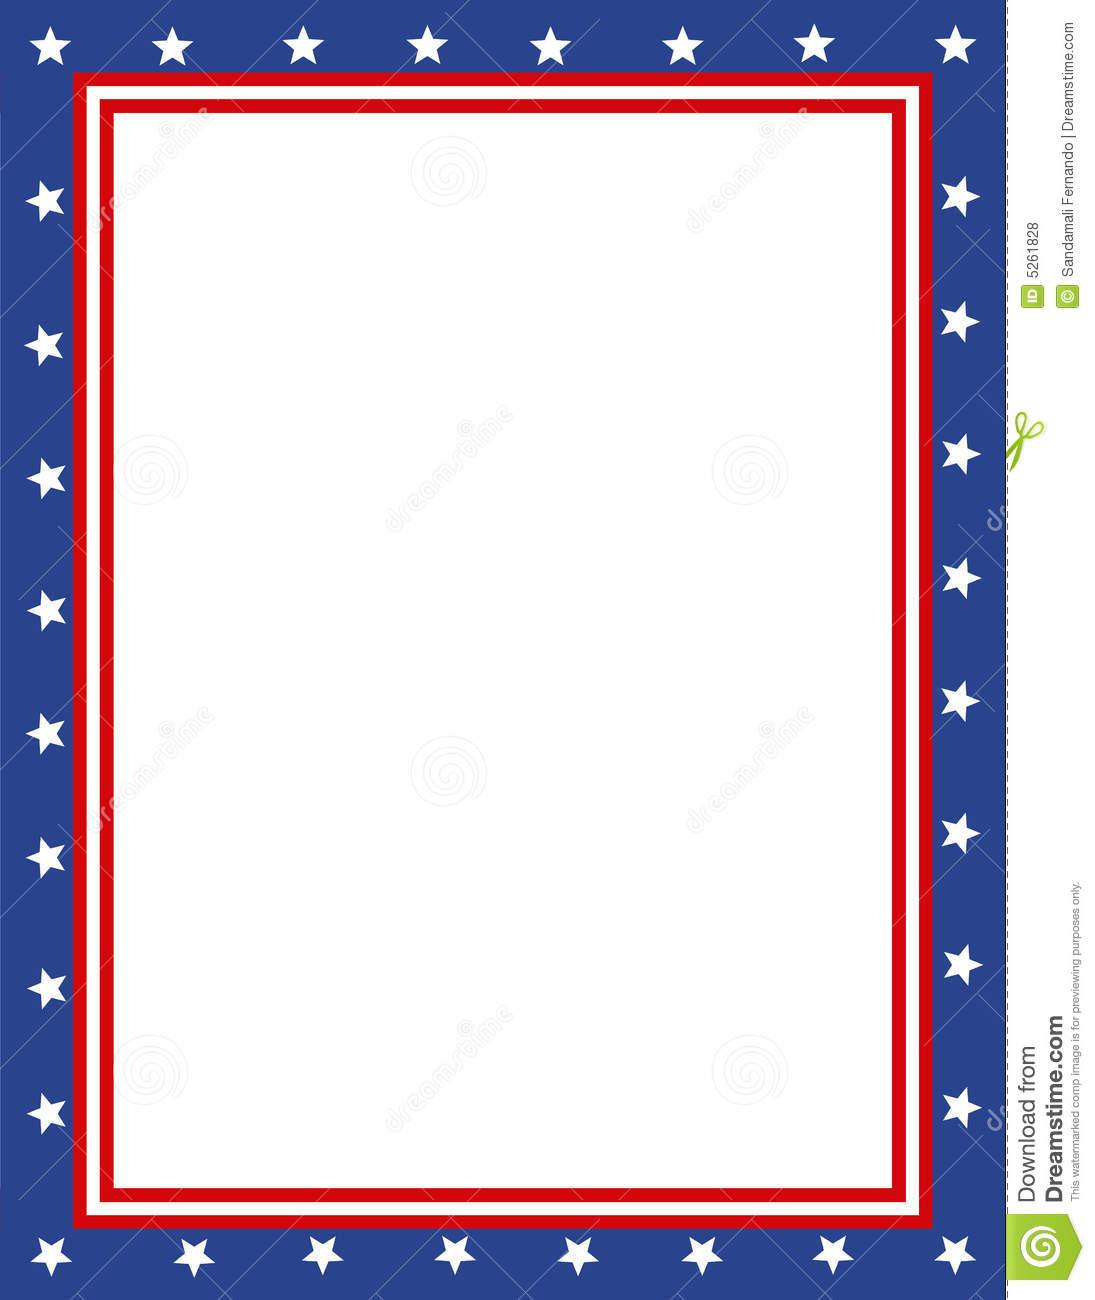 patriotic templates free microsoft word